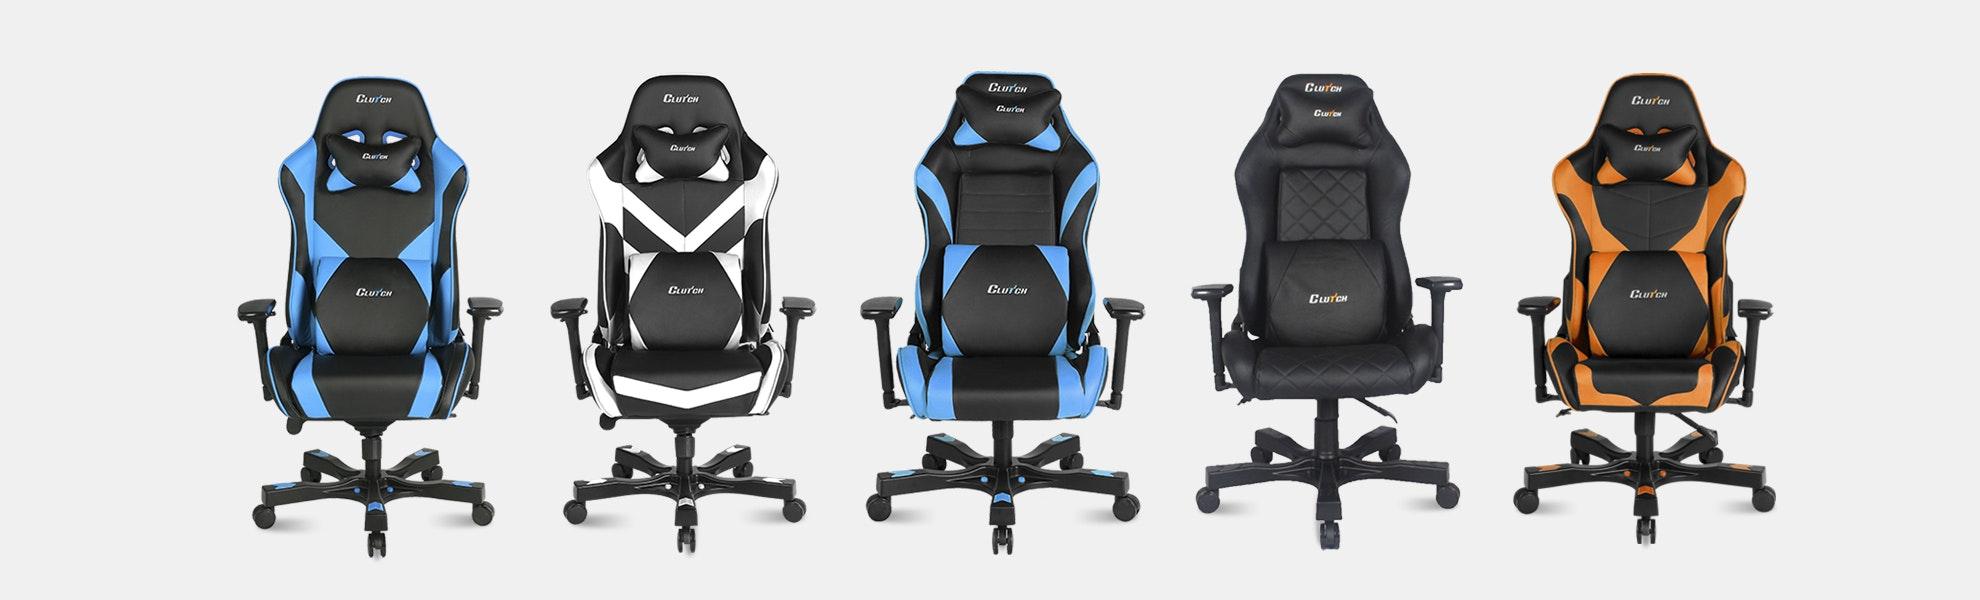 gaming chairs cynthia rowley chair clutch price reviews massdrop